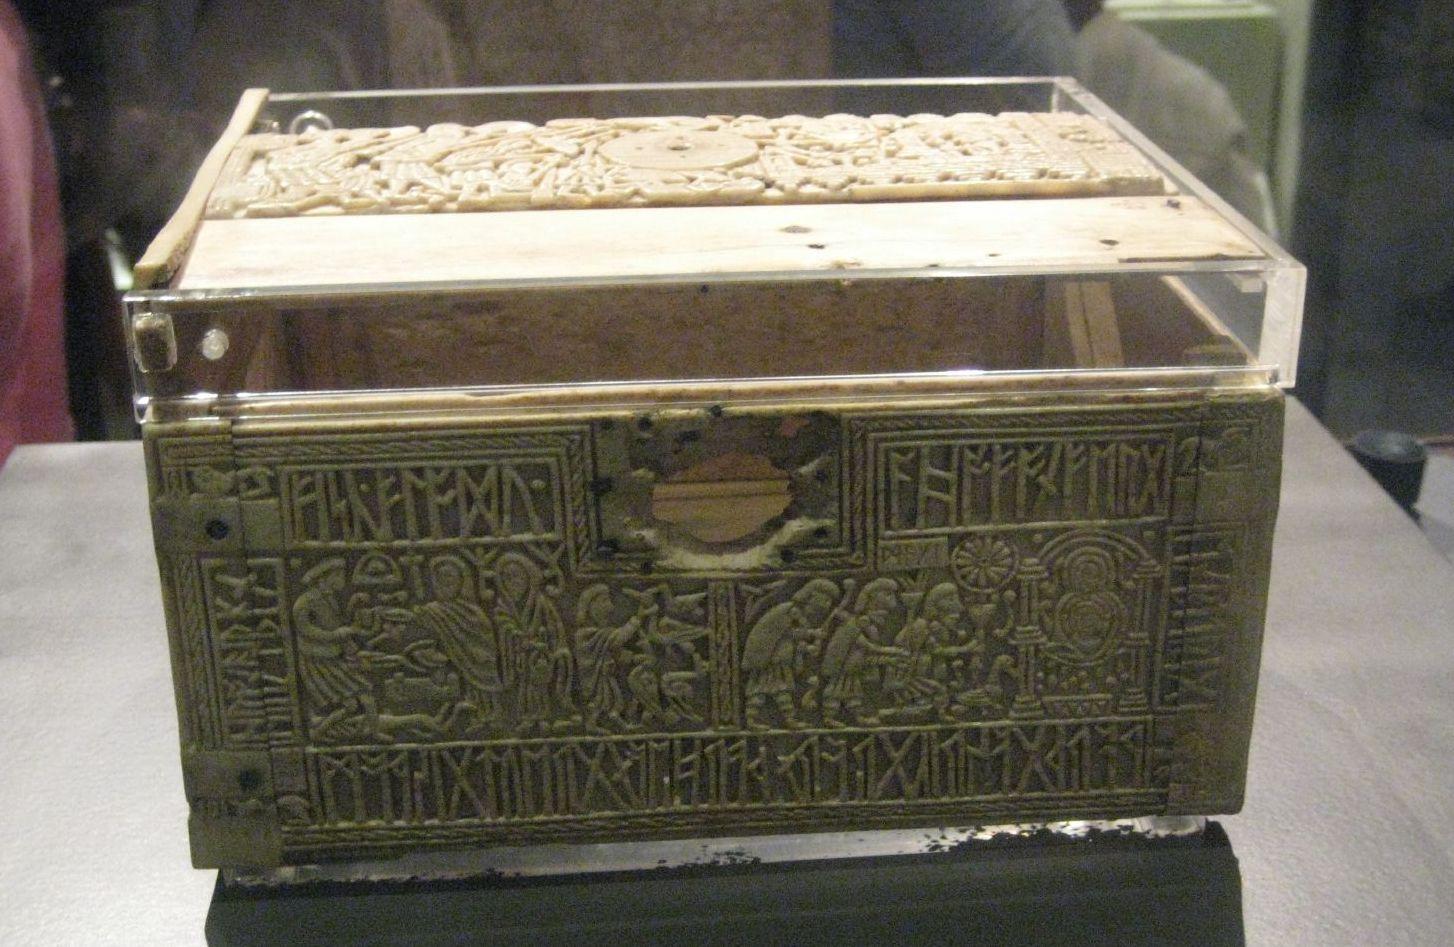 Тайны ларца из британского музея. Ларец «Franks casket»